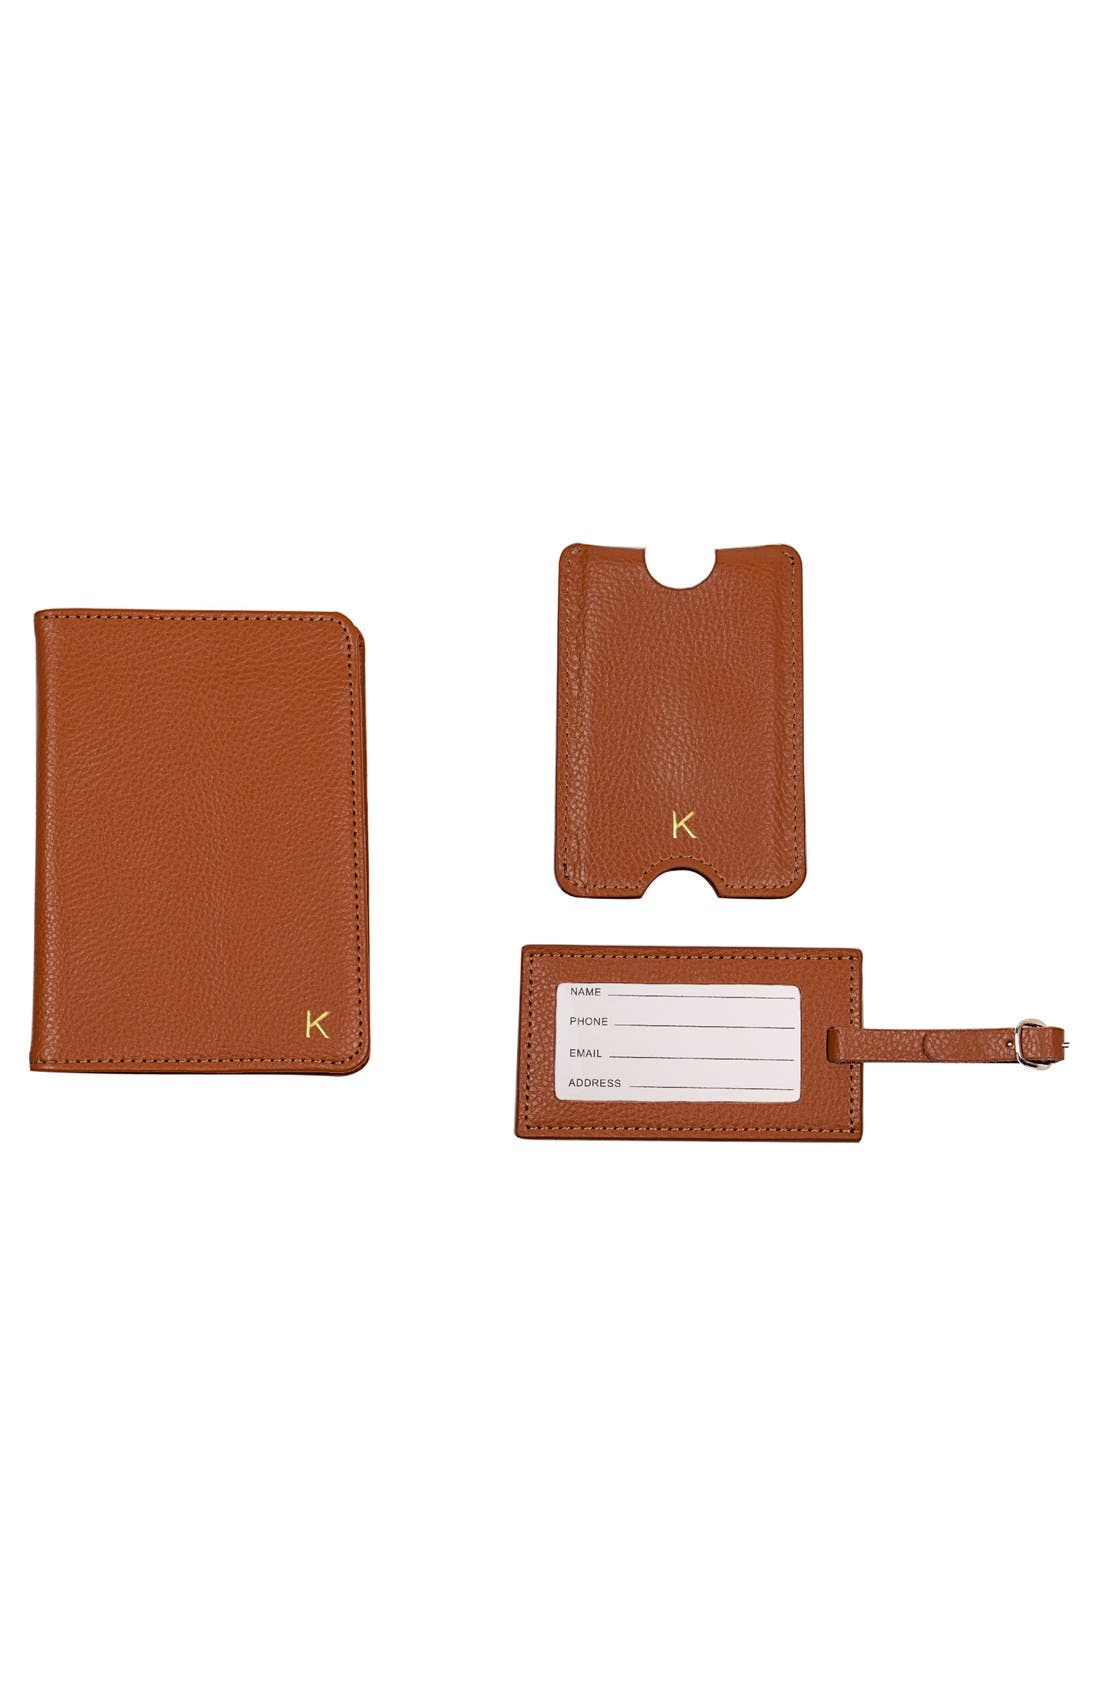 Alternate Image 3  - Cathy's Concepts Monogram Passport Case & Luggage Tag